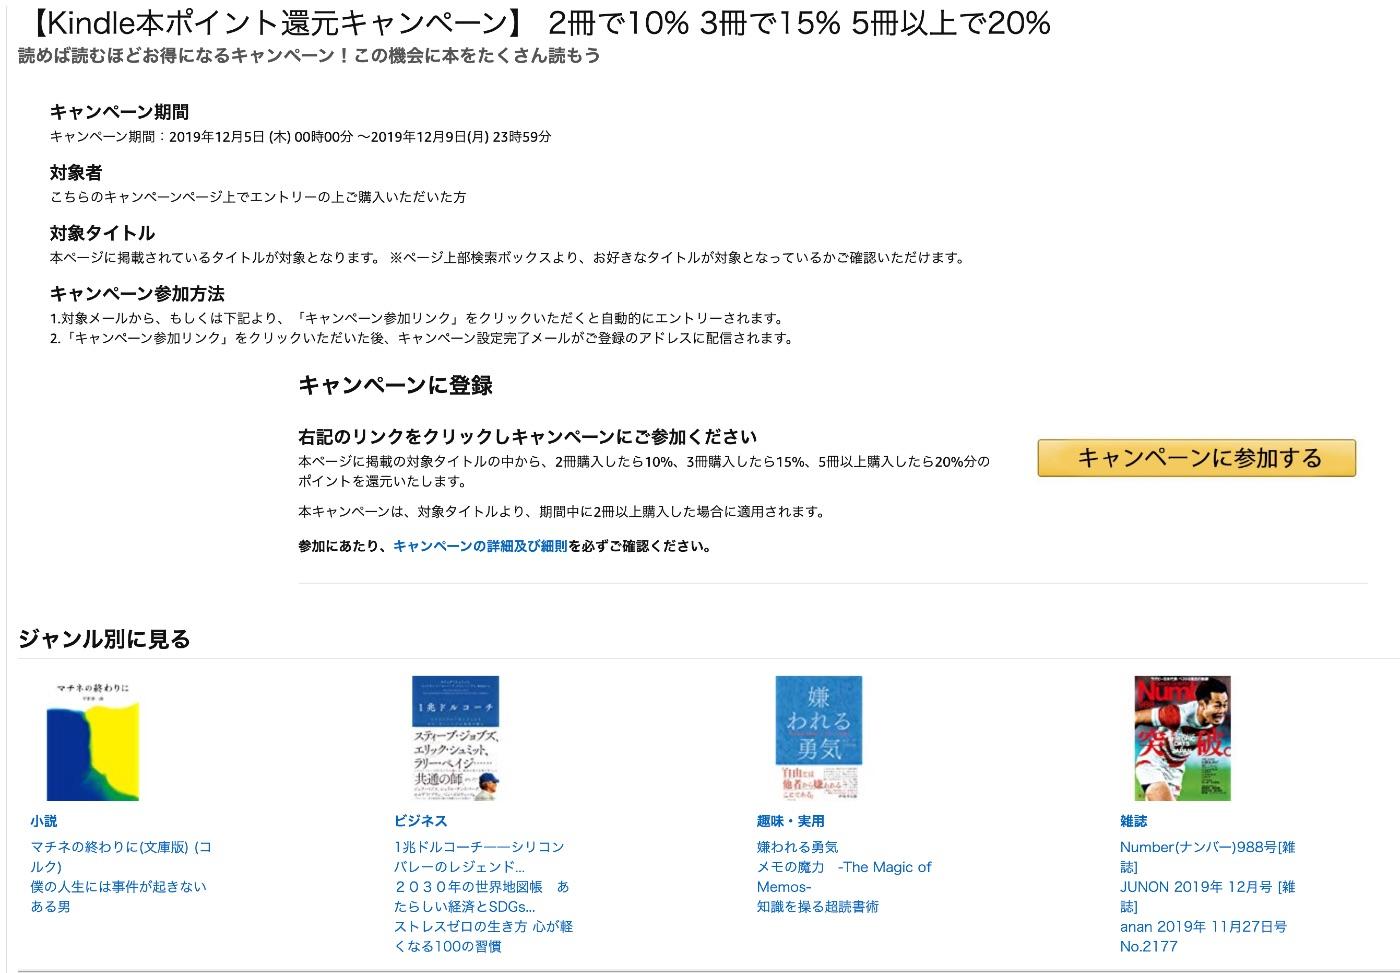 【Kindle本ポイント還元キャンペーン】 2冊で10% 3冊で15% 5冊以上で20%